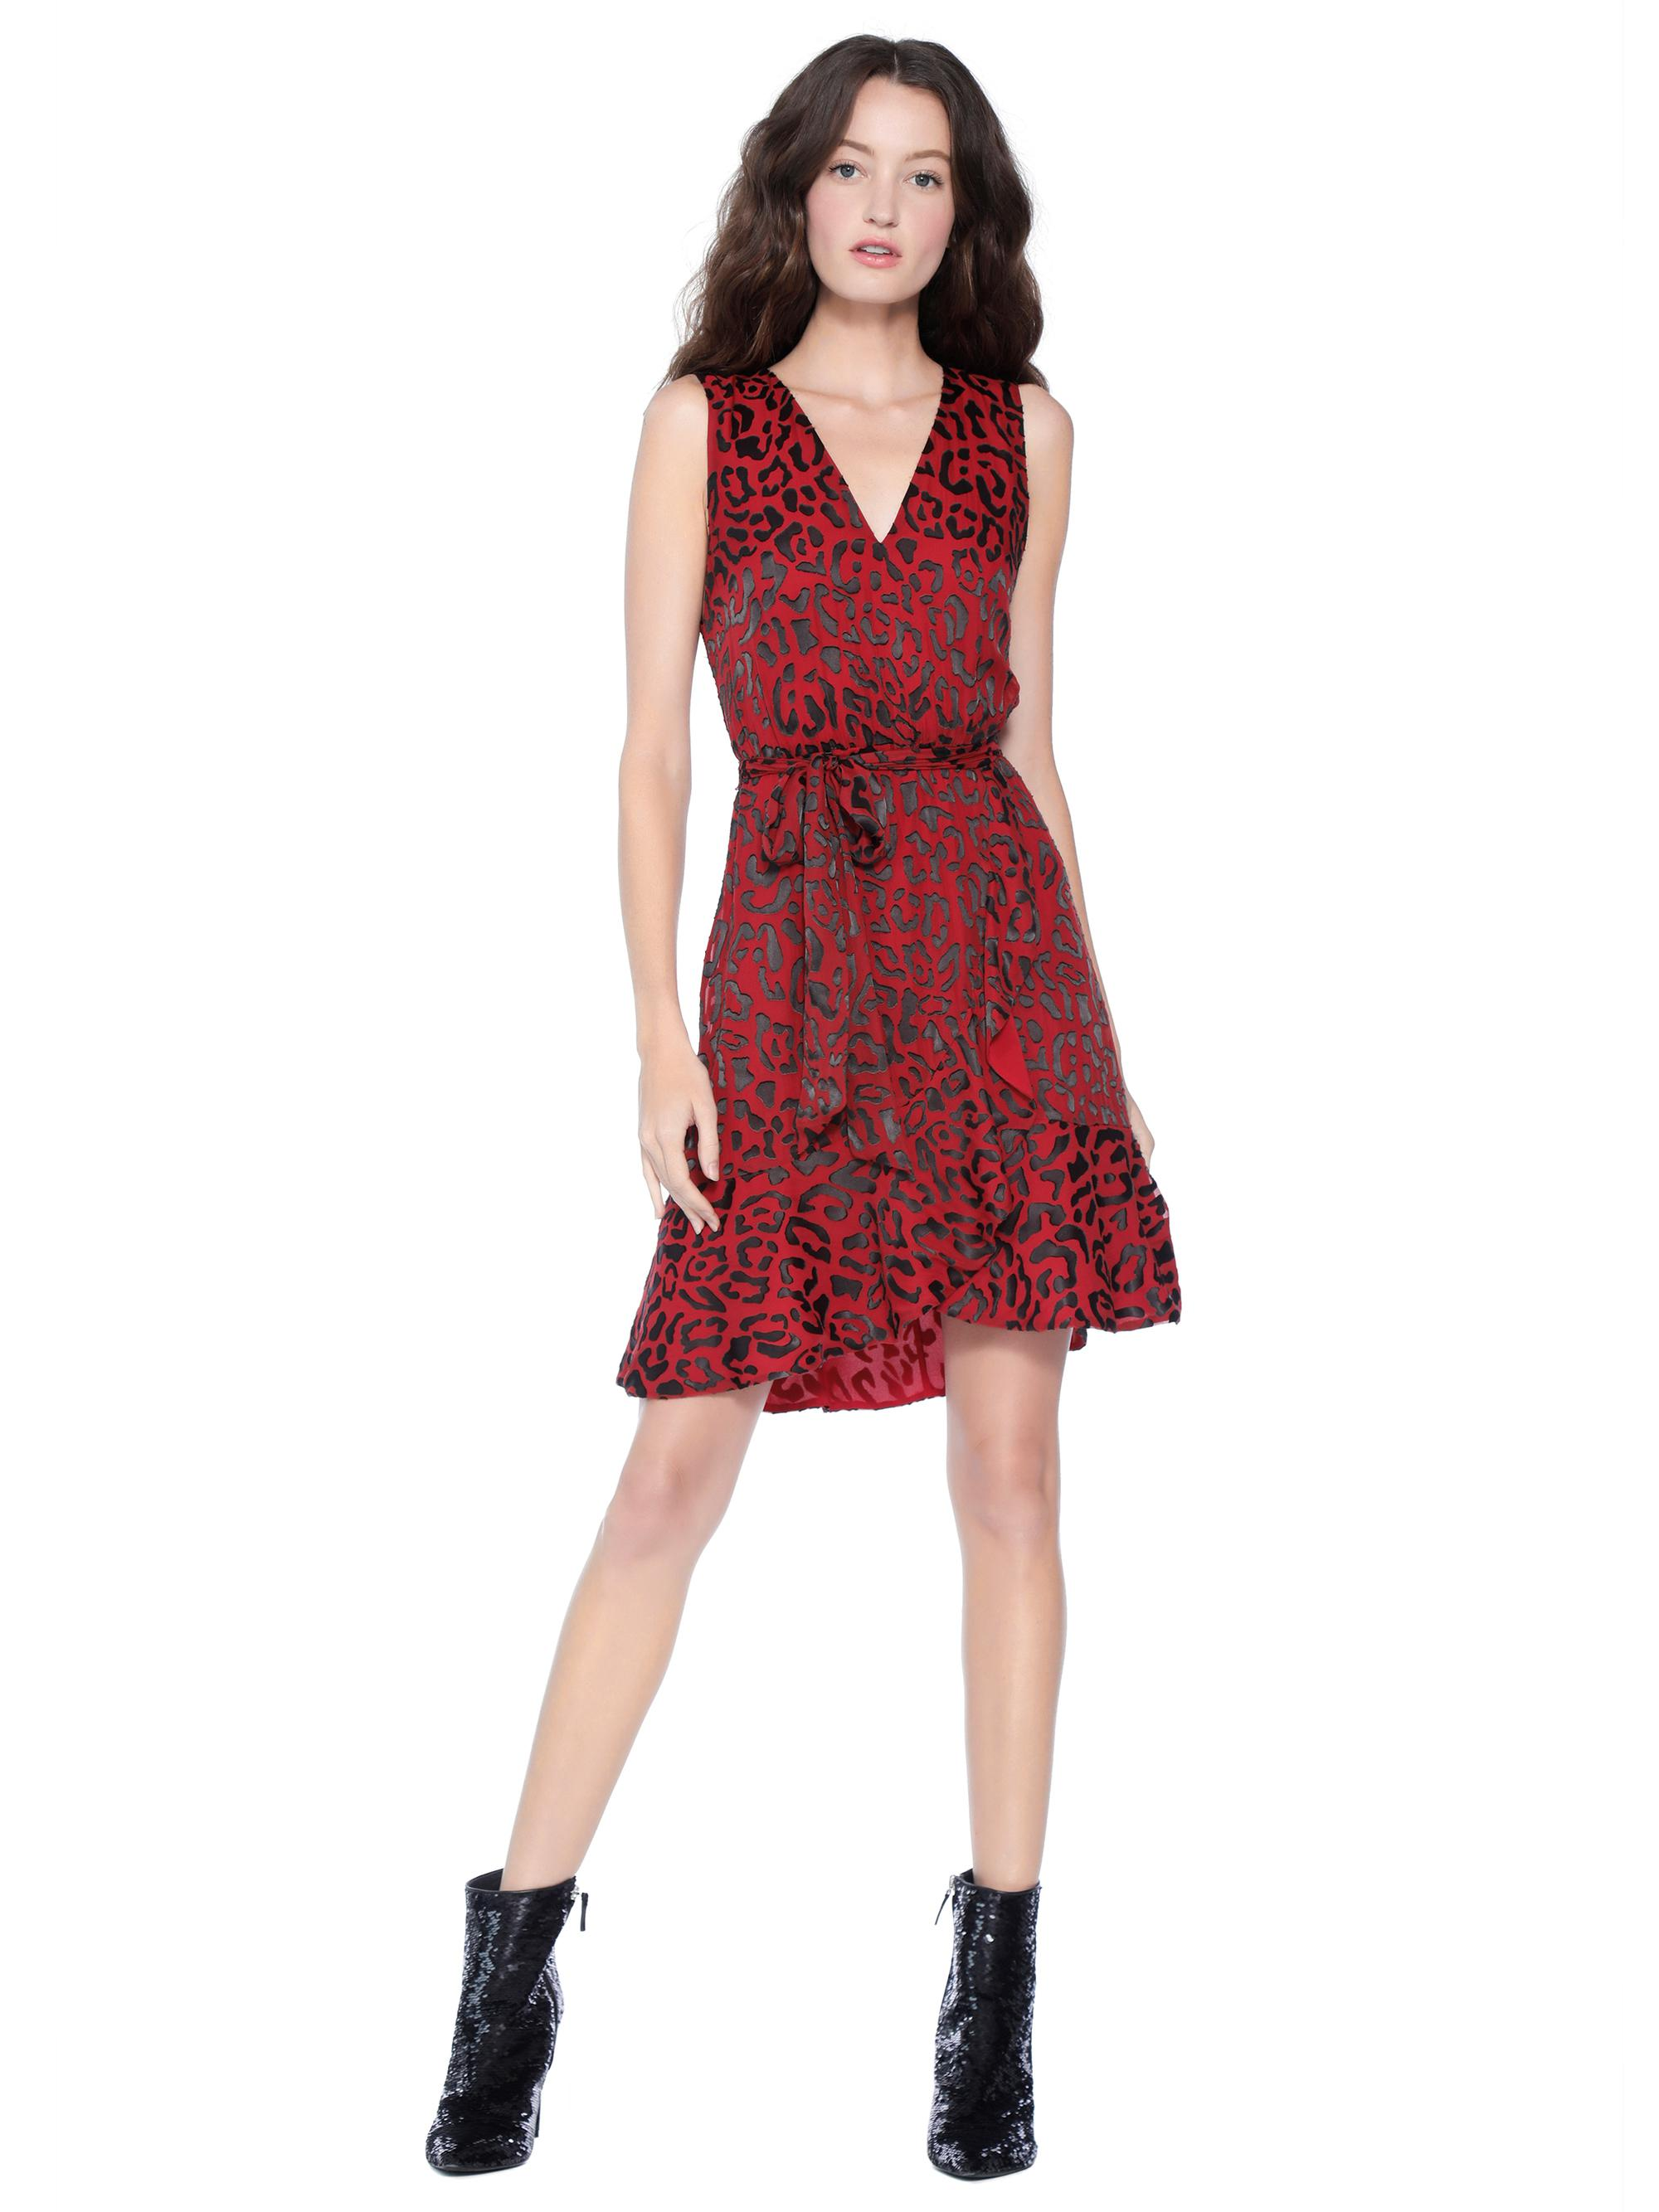 b1ec45c5f299 Alice + Olivia Brooks Animal Print Fit & Flare Dress in Red - Lyst